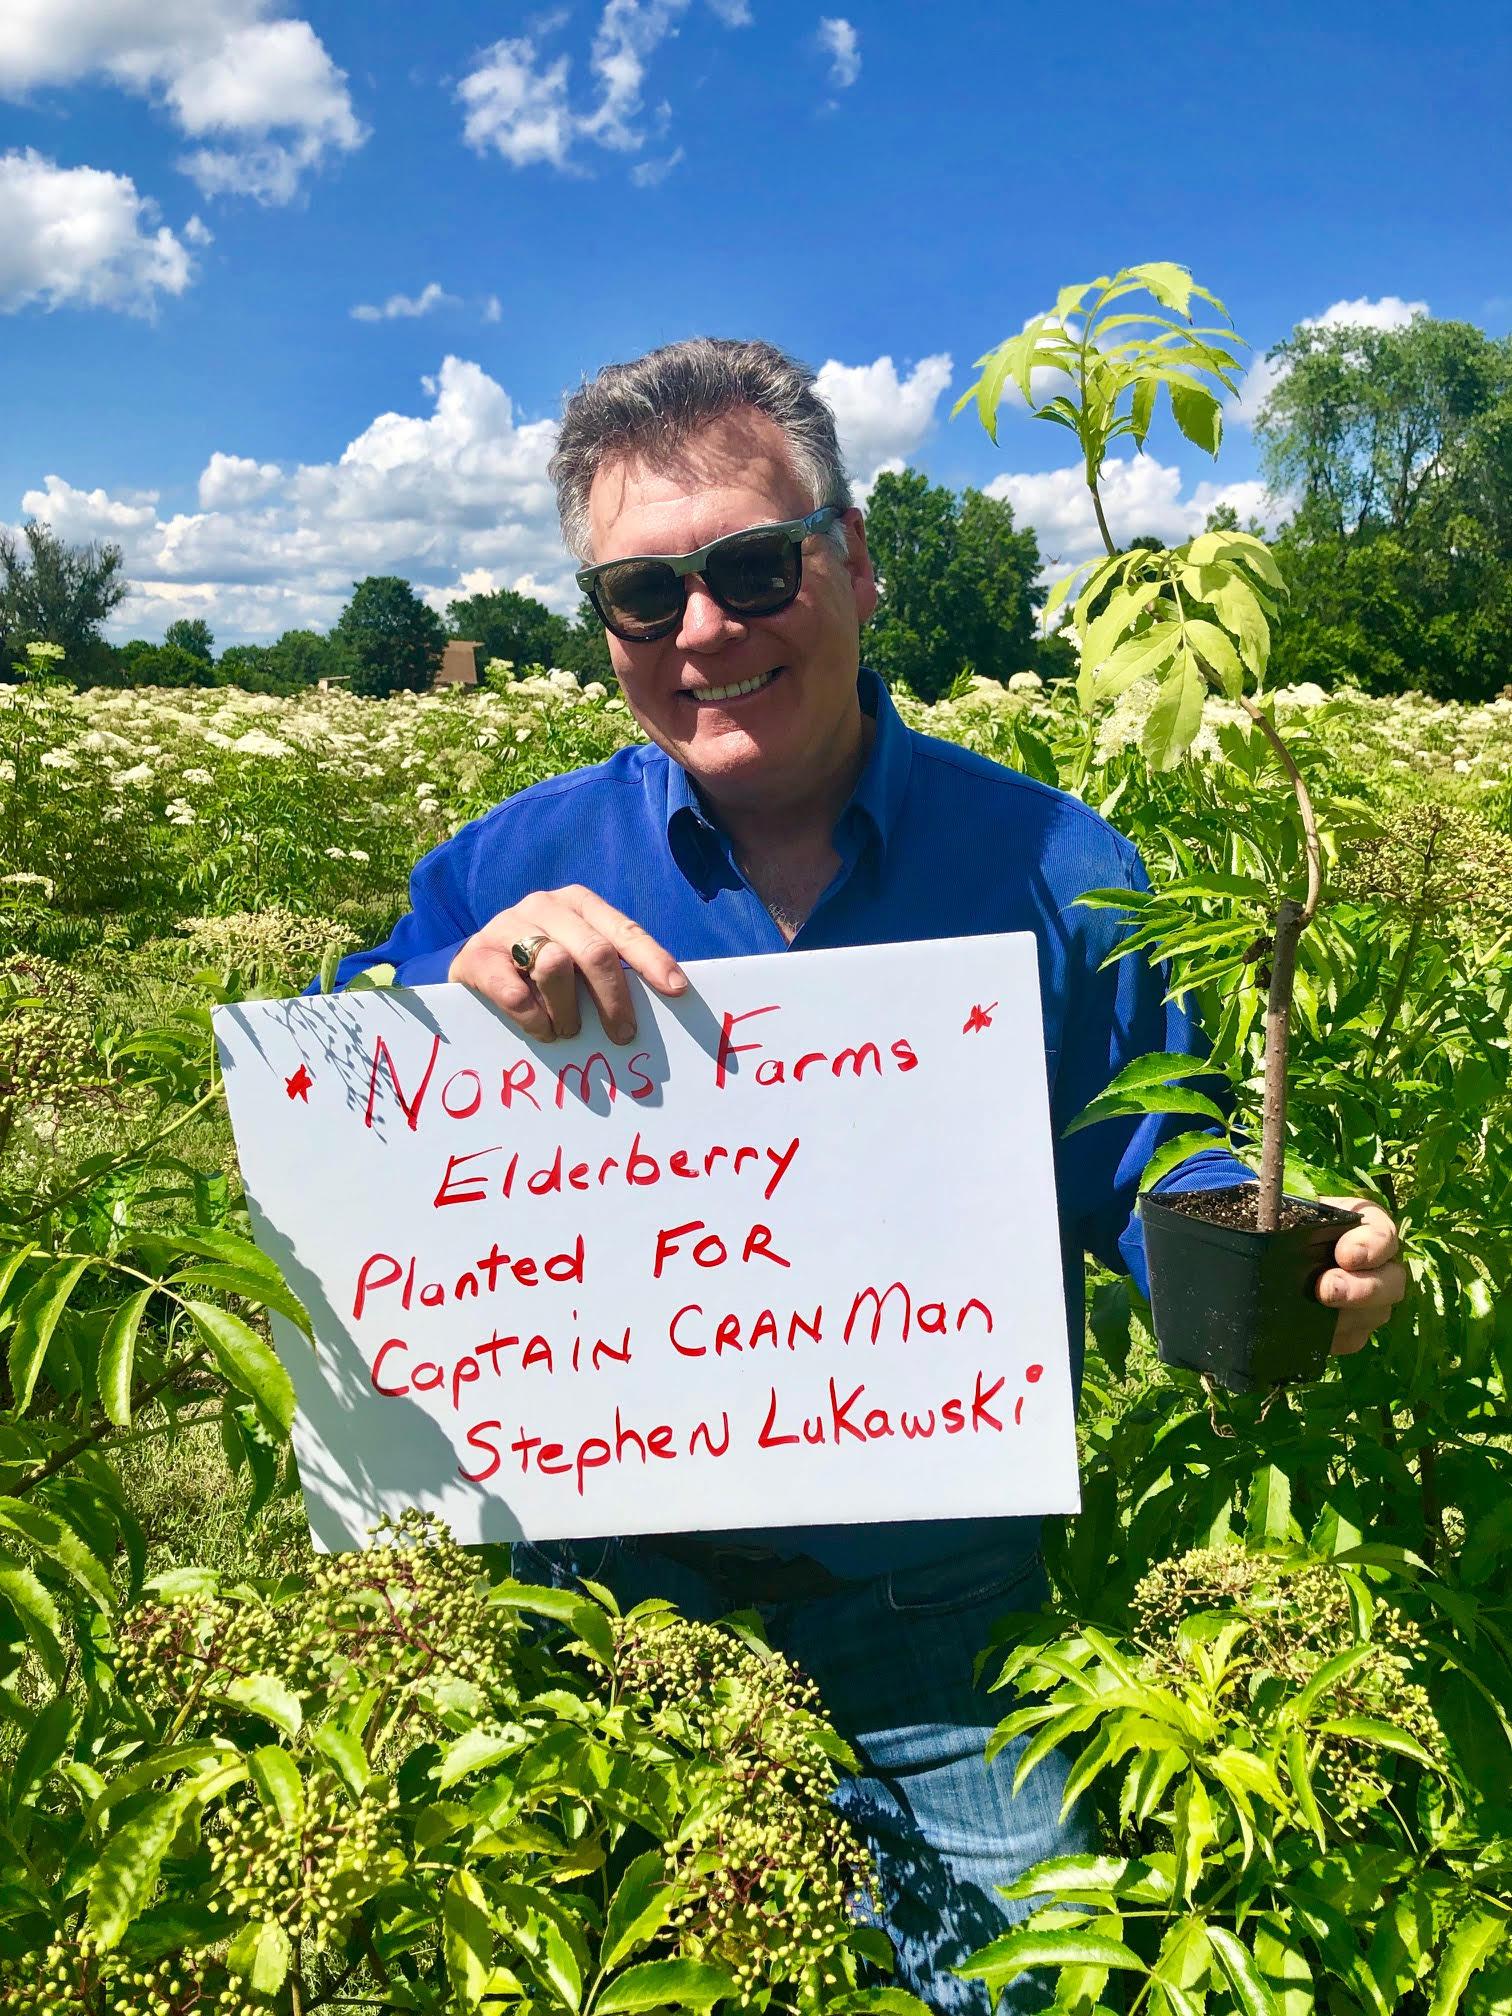 Plant-Elderberry-Captain-CranMan-Stephen-Lukawski.jpg